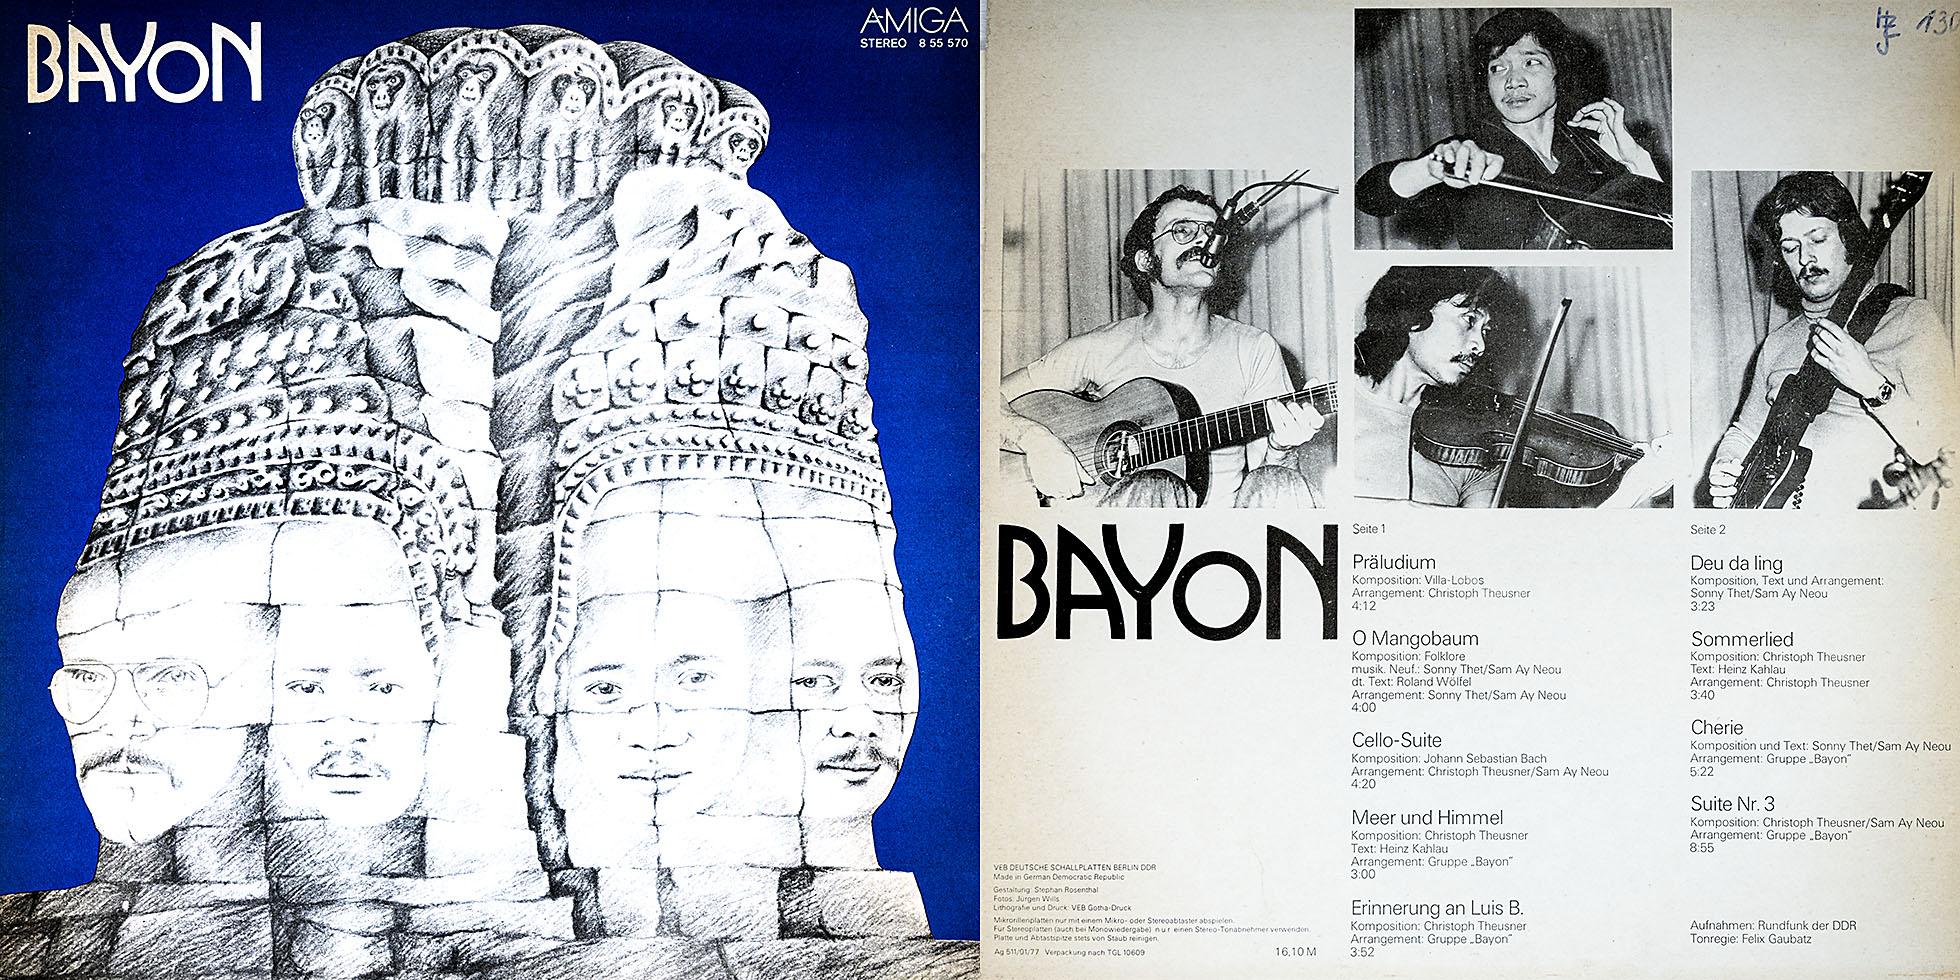 Bayon - Bayon